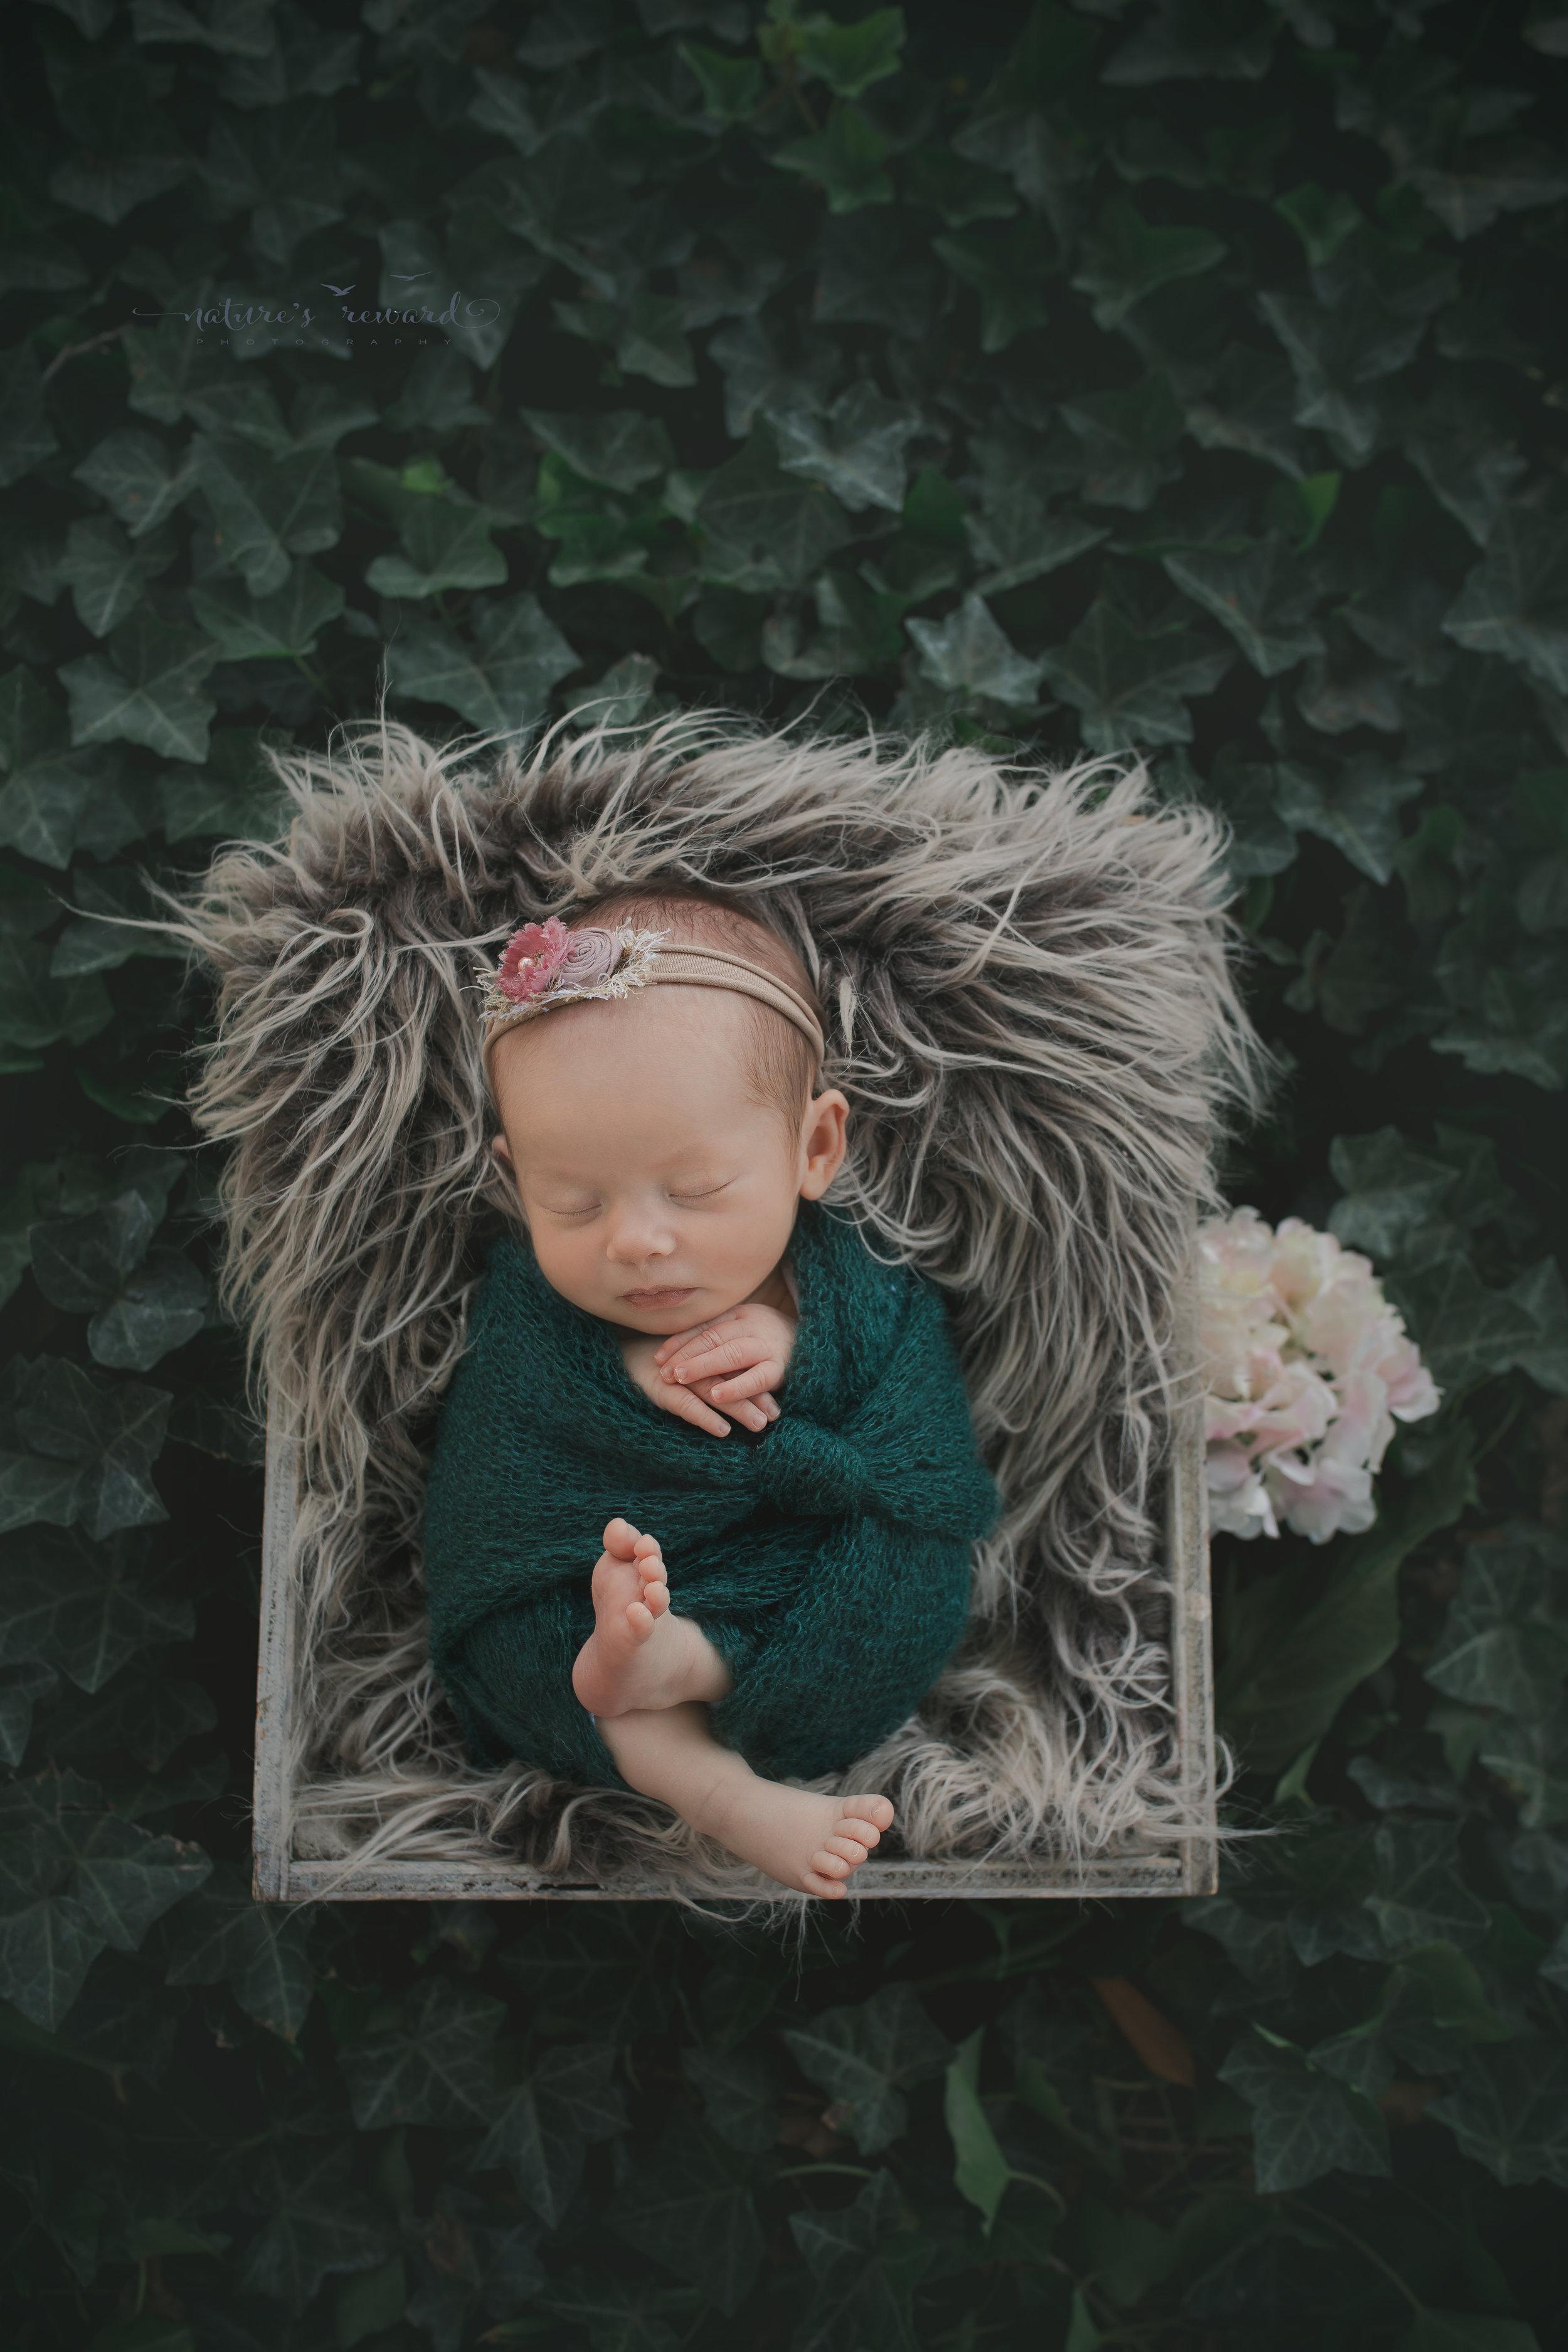 A newborn portrait by Nature's Reward Photography